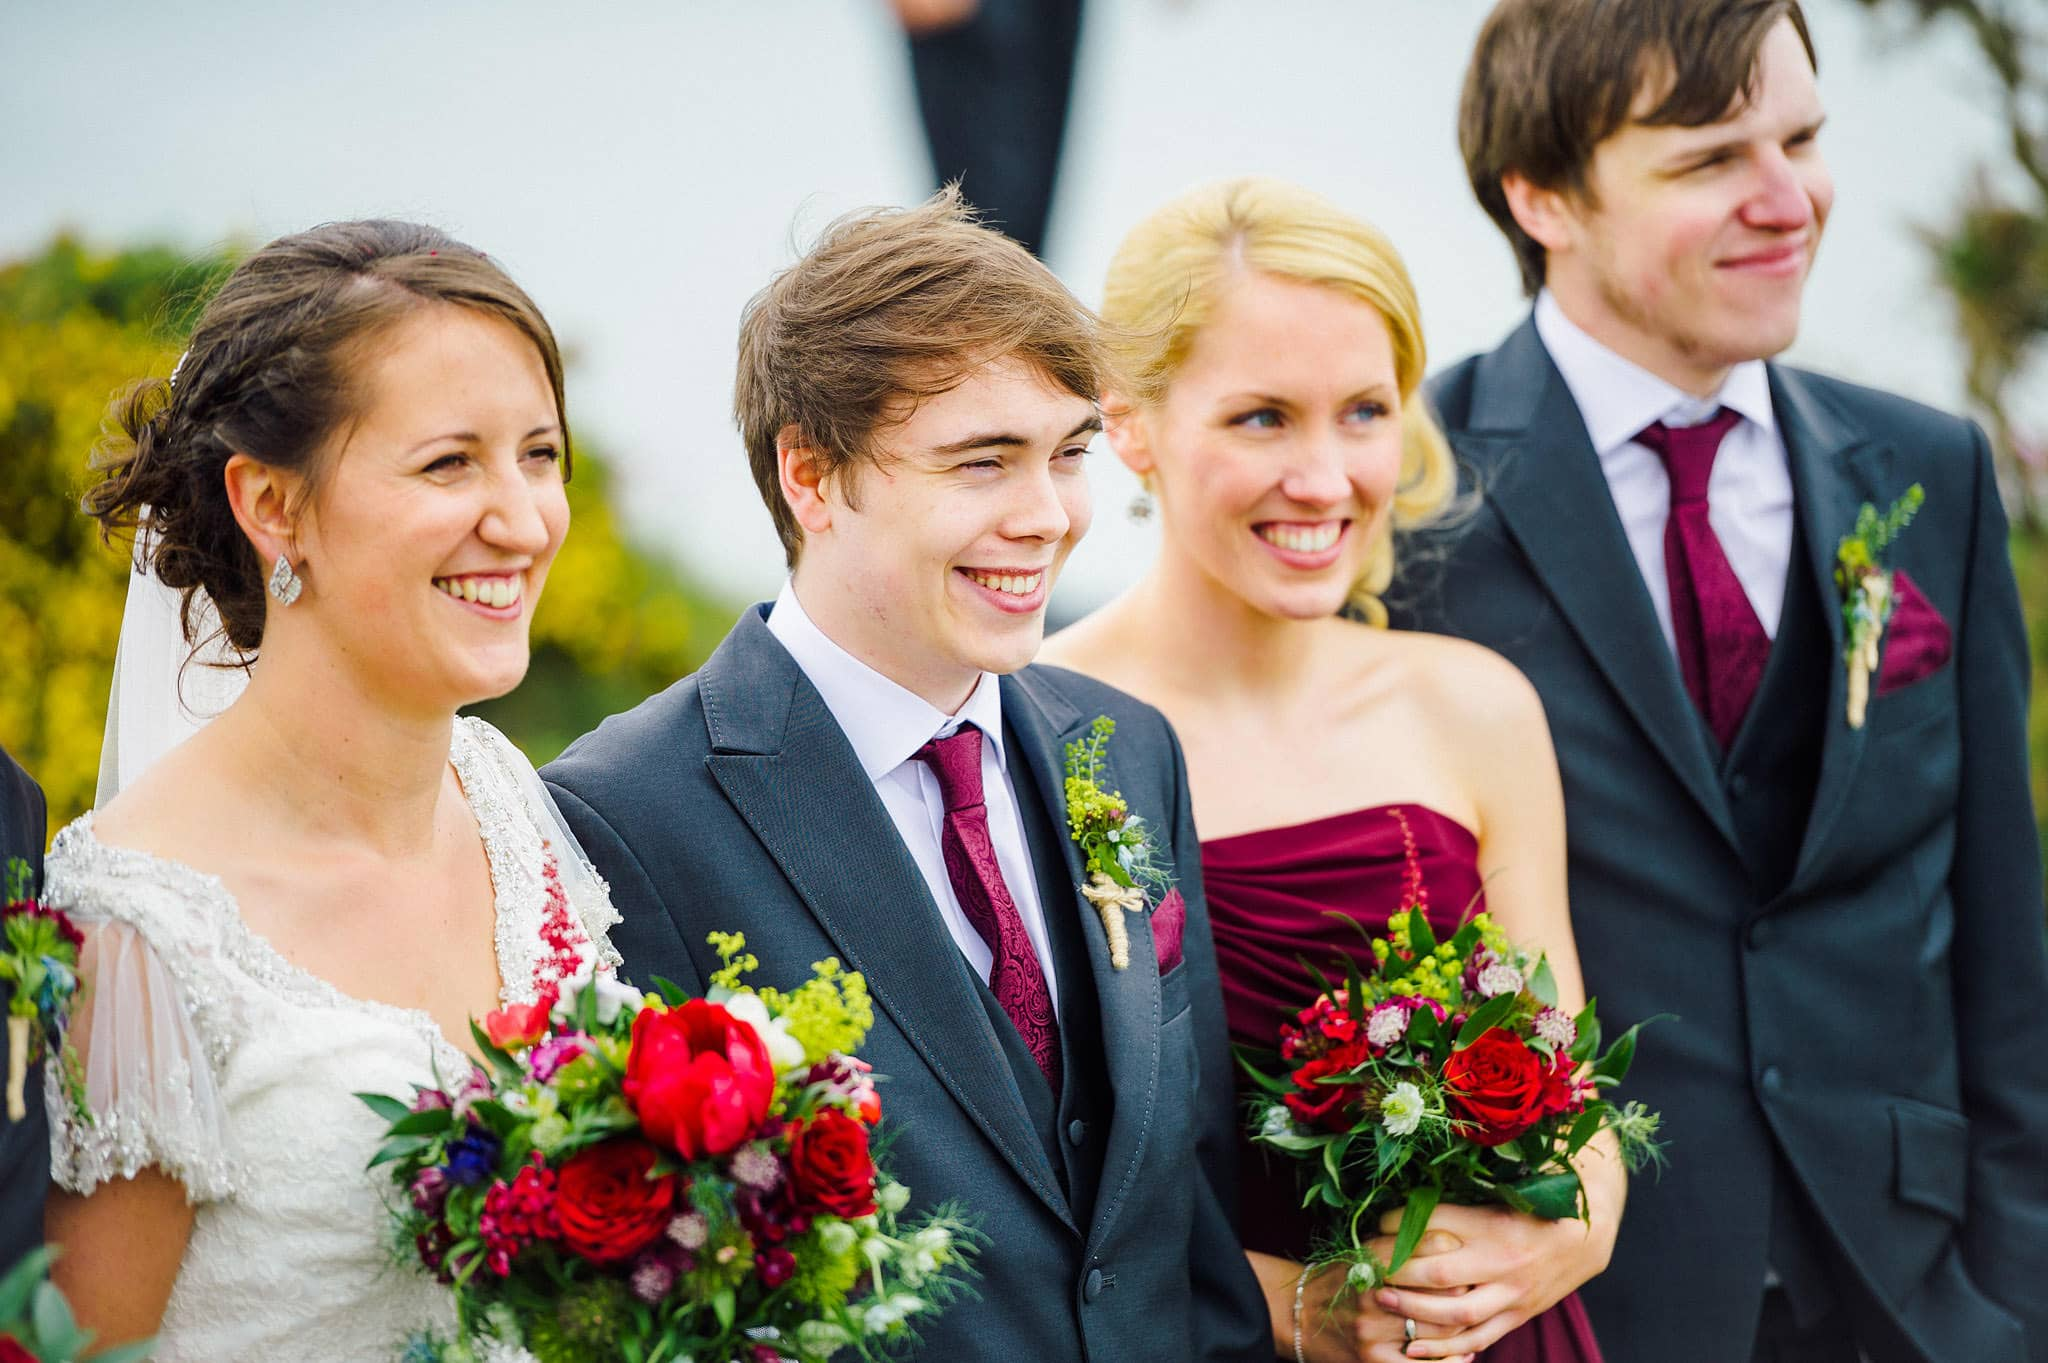 wedding-photographer-aberystwyth-wales (161)